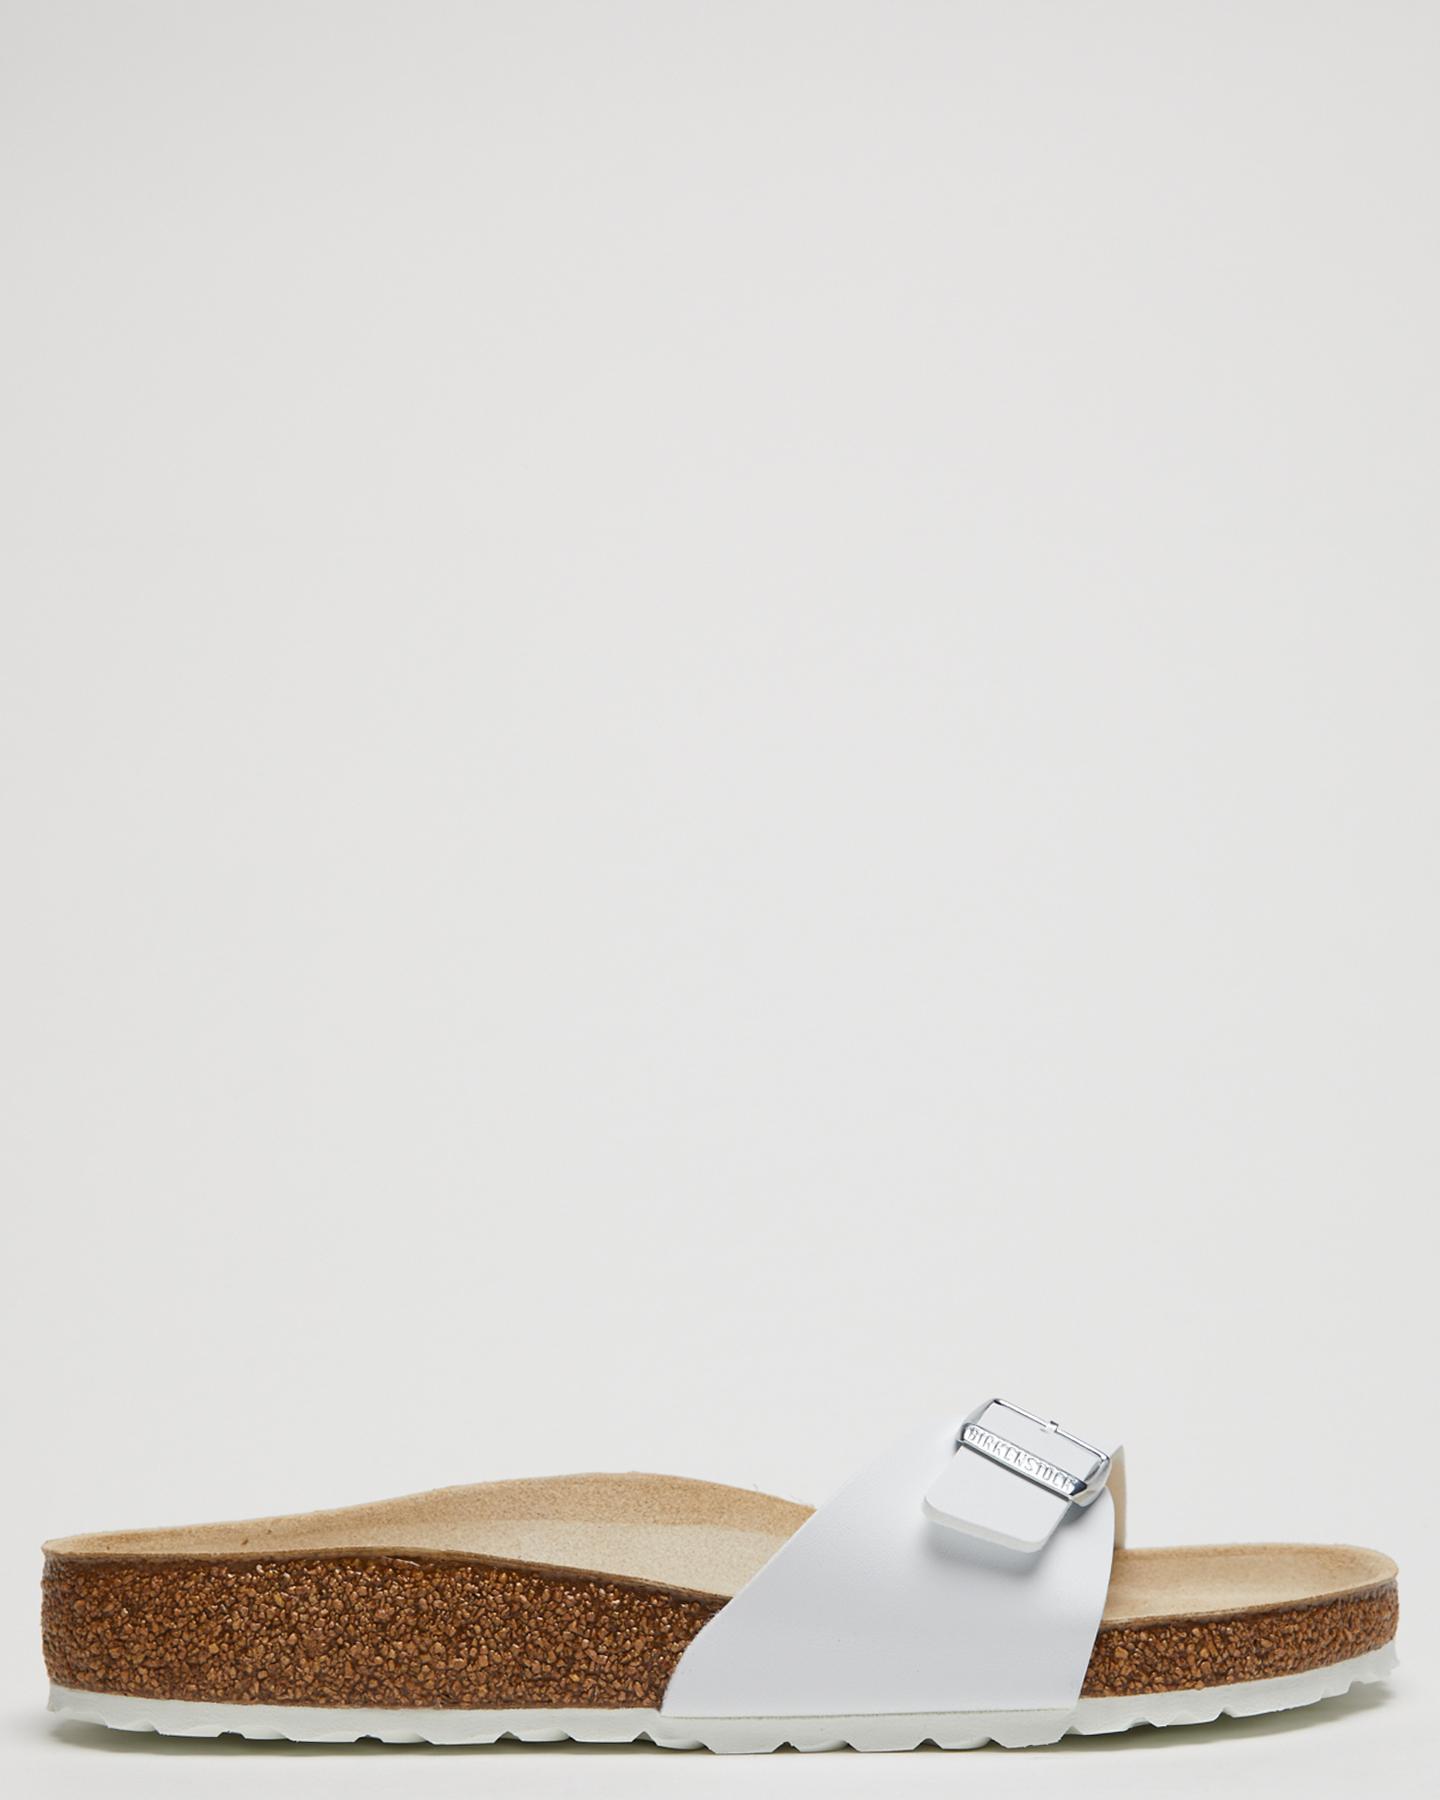 64e703ba38b69 Birkenstock Women s Womens Regular Madrid Sandal Suede Birko-Flor White